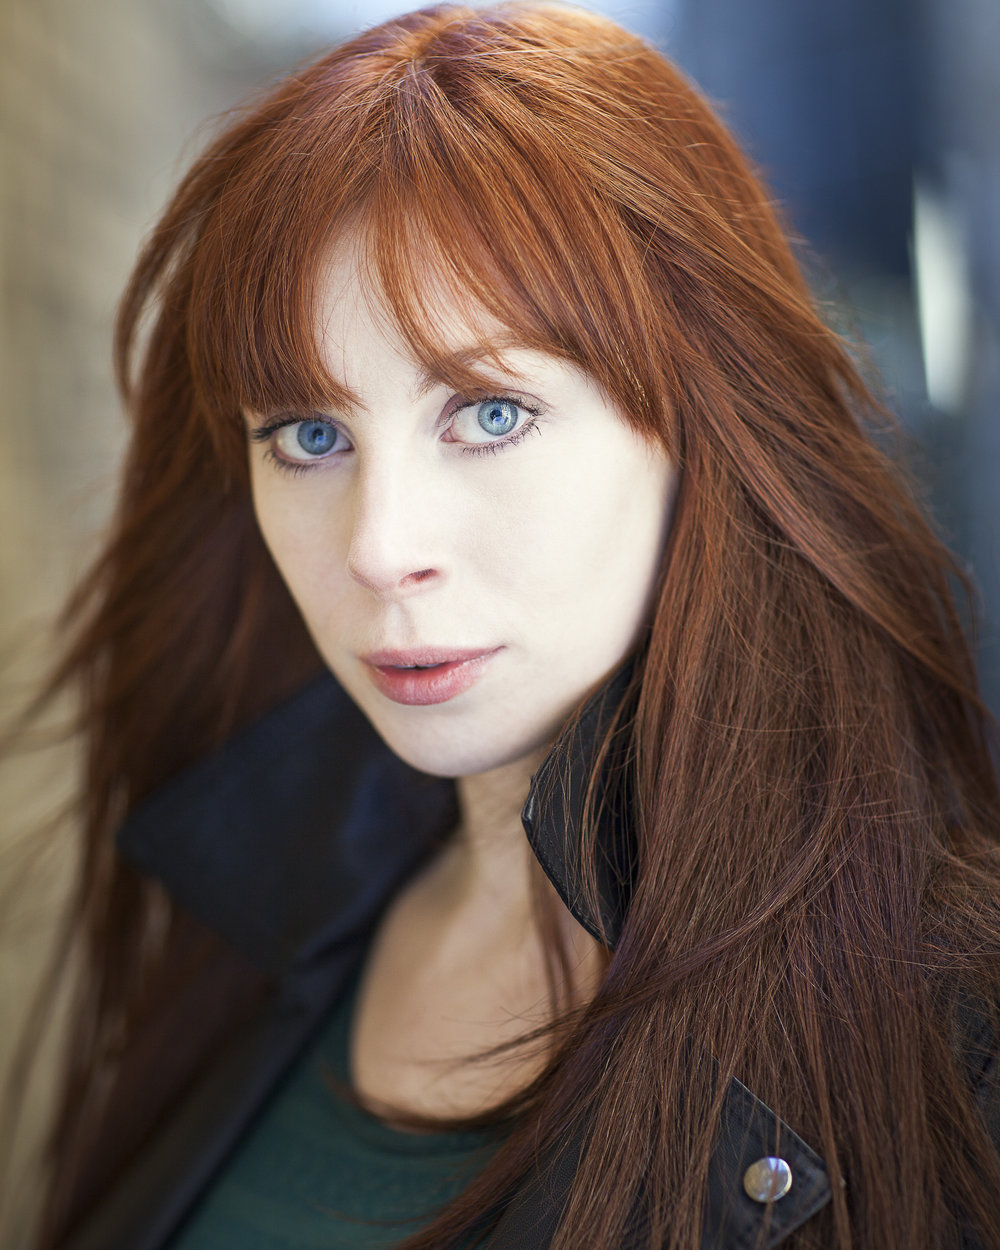 Gillian-MacGregor-headshot-credit-michael-wharley-2.jpg